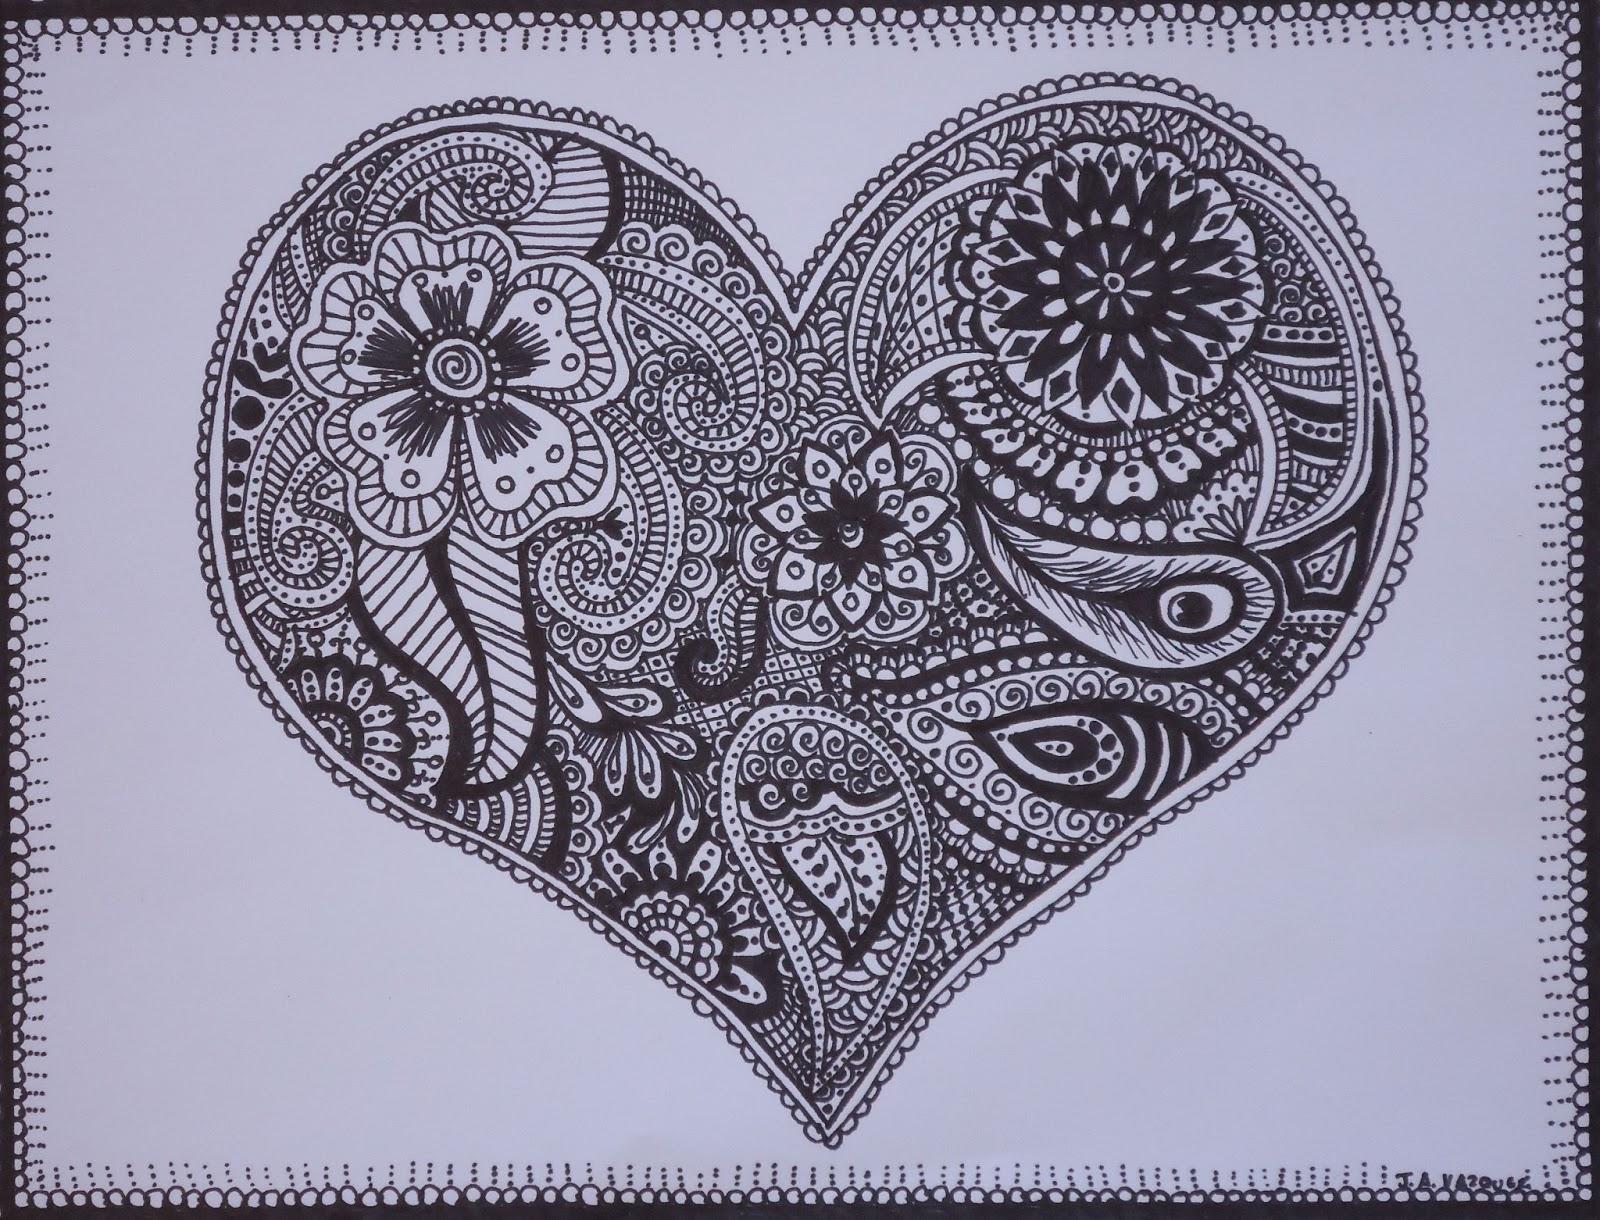 Mehndi Drawing Designs : Vazquez style art mehndi henna ink drawings